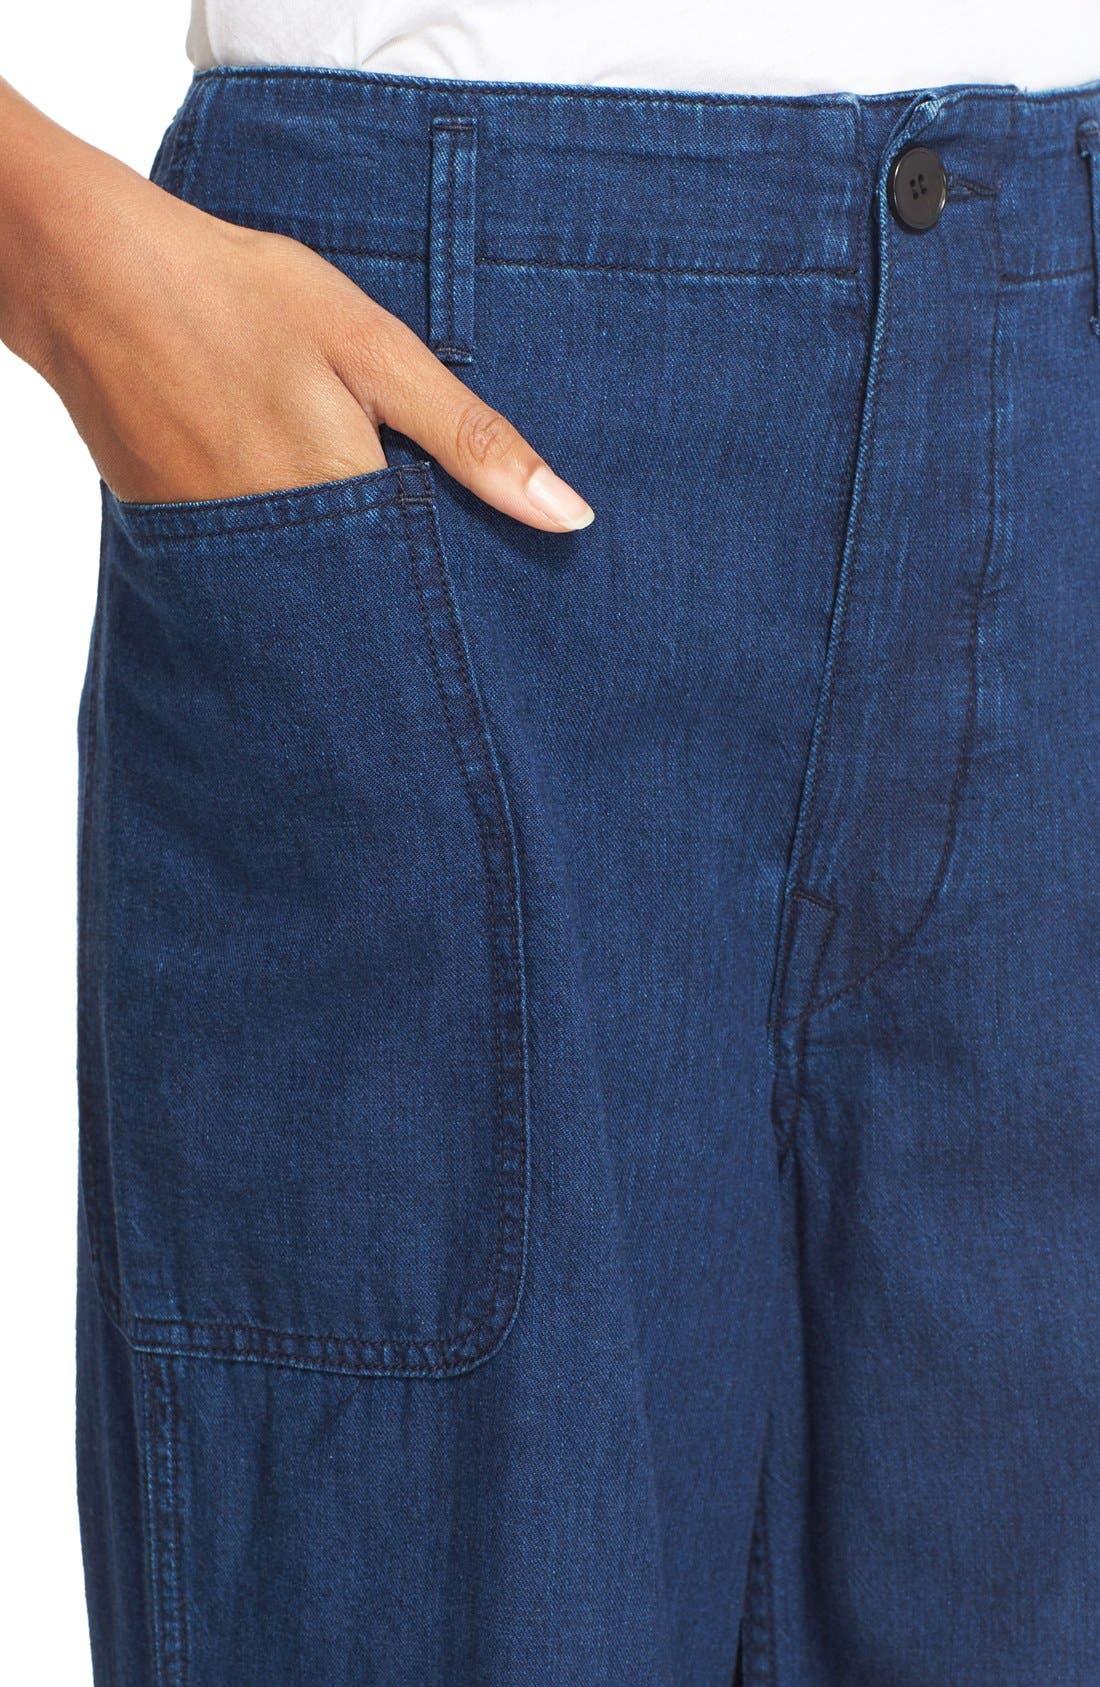 Rinsed Denim Patch Pocket Utility Pants,                             Alternate thumbnail 5, color,                             400